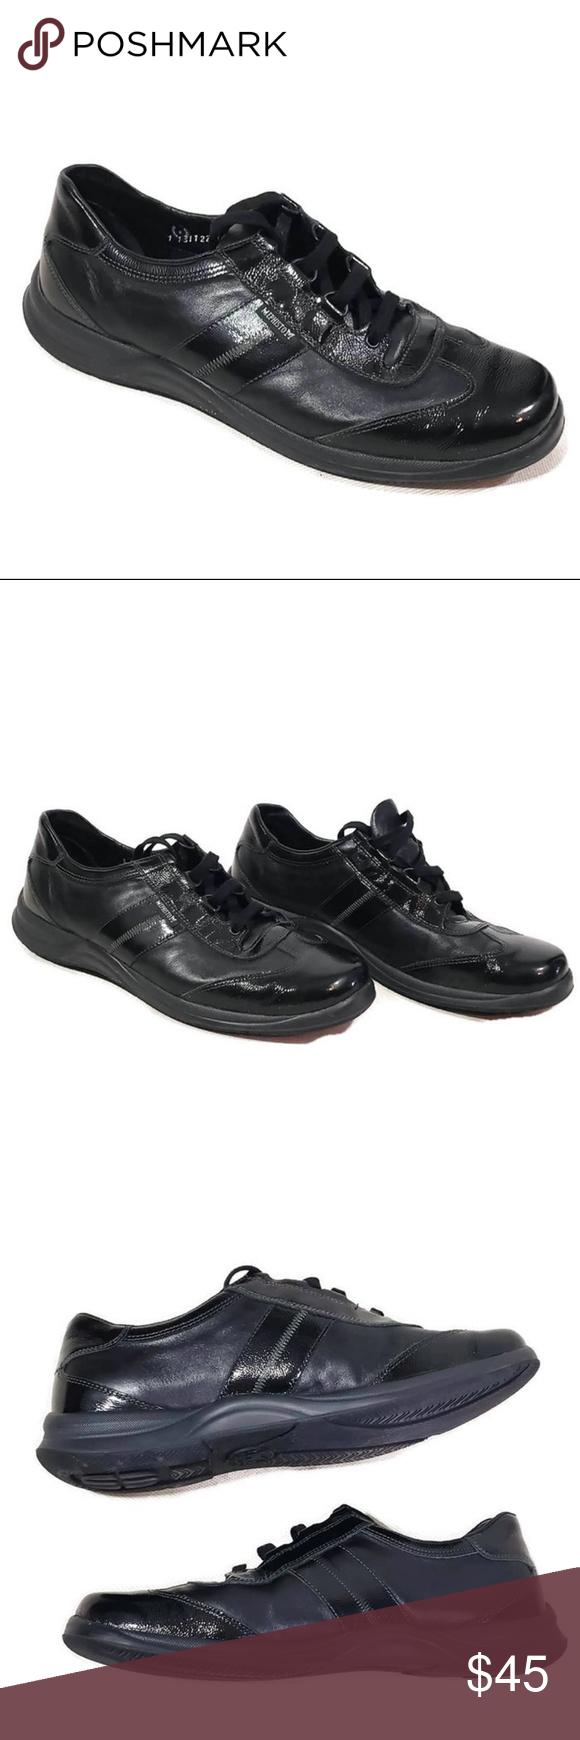 Mephisto Laser Black Sneakers walking shoes 10.5 Black